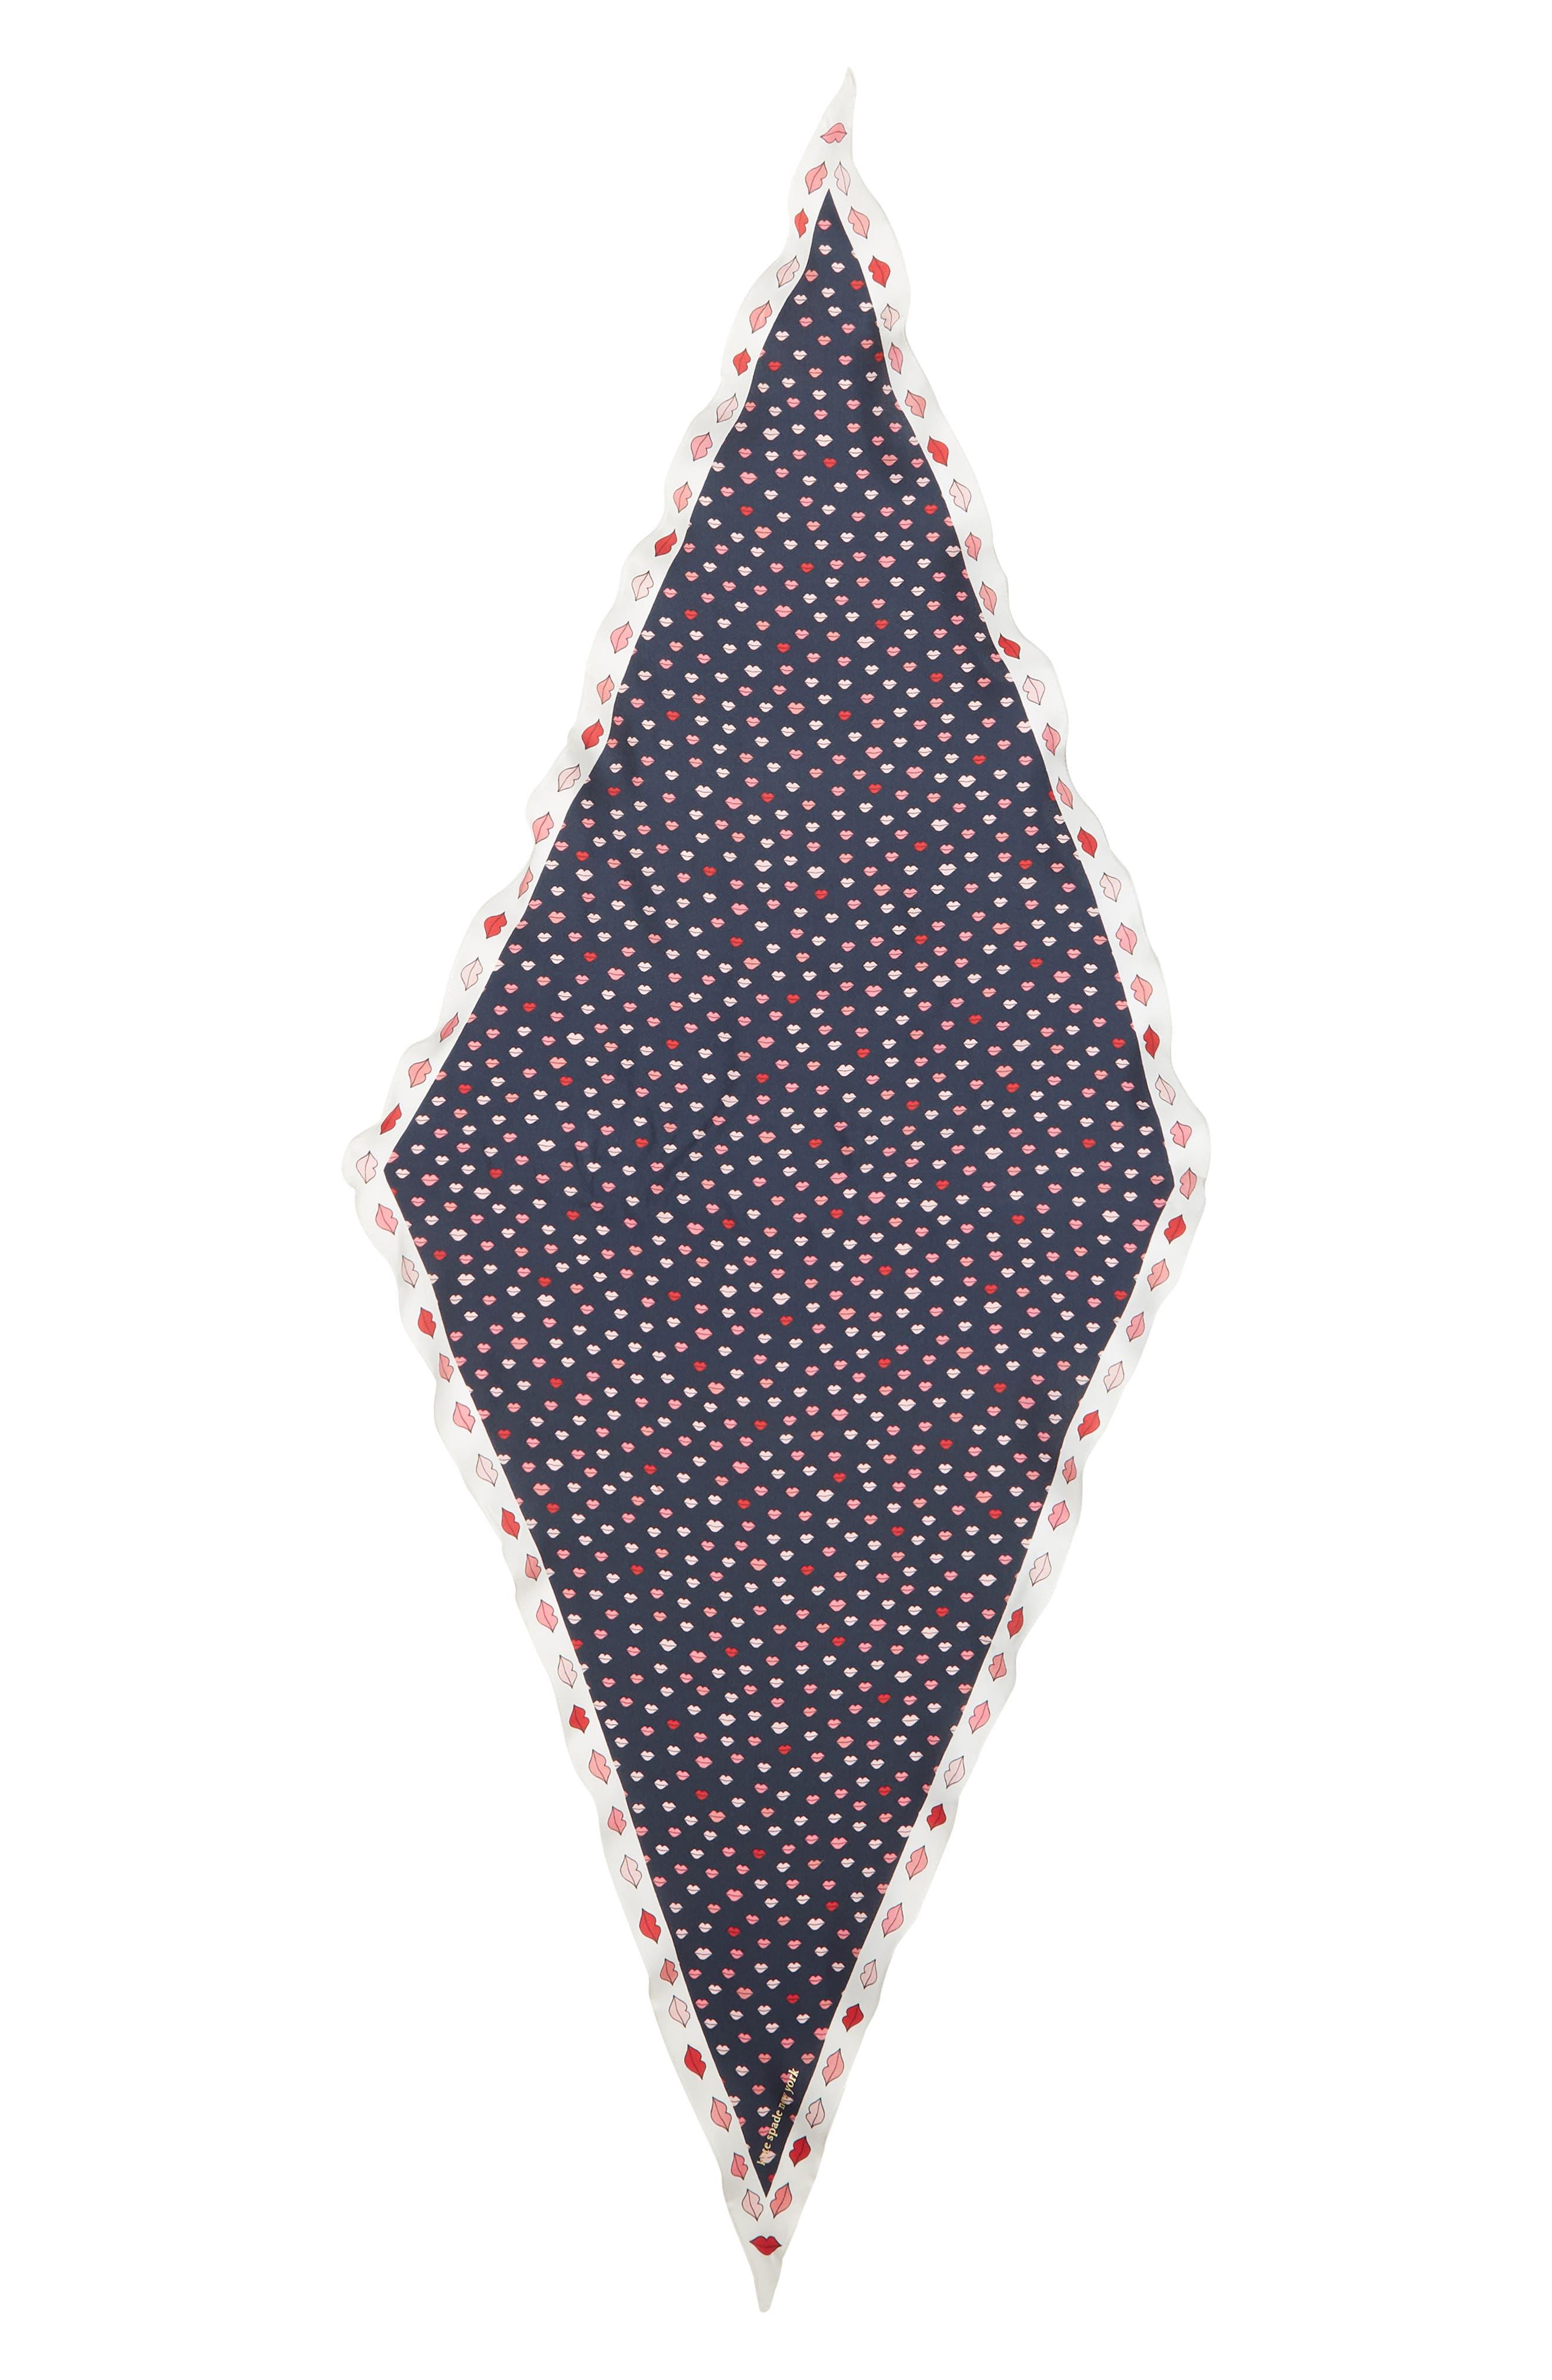 KATE SPADE NEW YORK,                             lips diamond silk scarf,                             Alternate thumbnail 3, color,                             PARISIAN NAVY